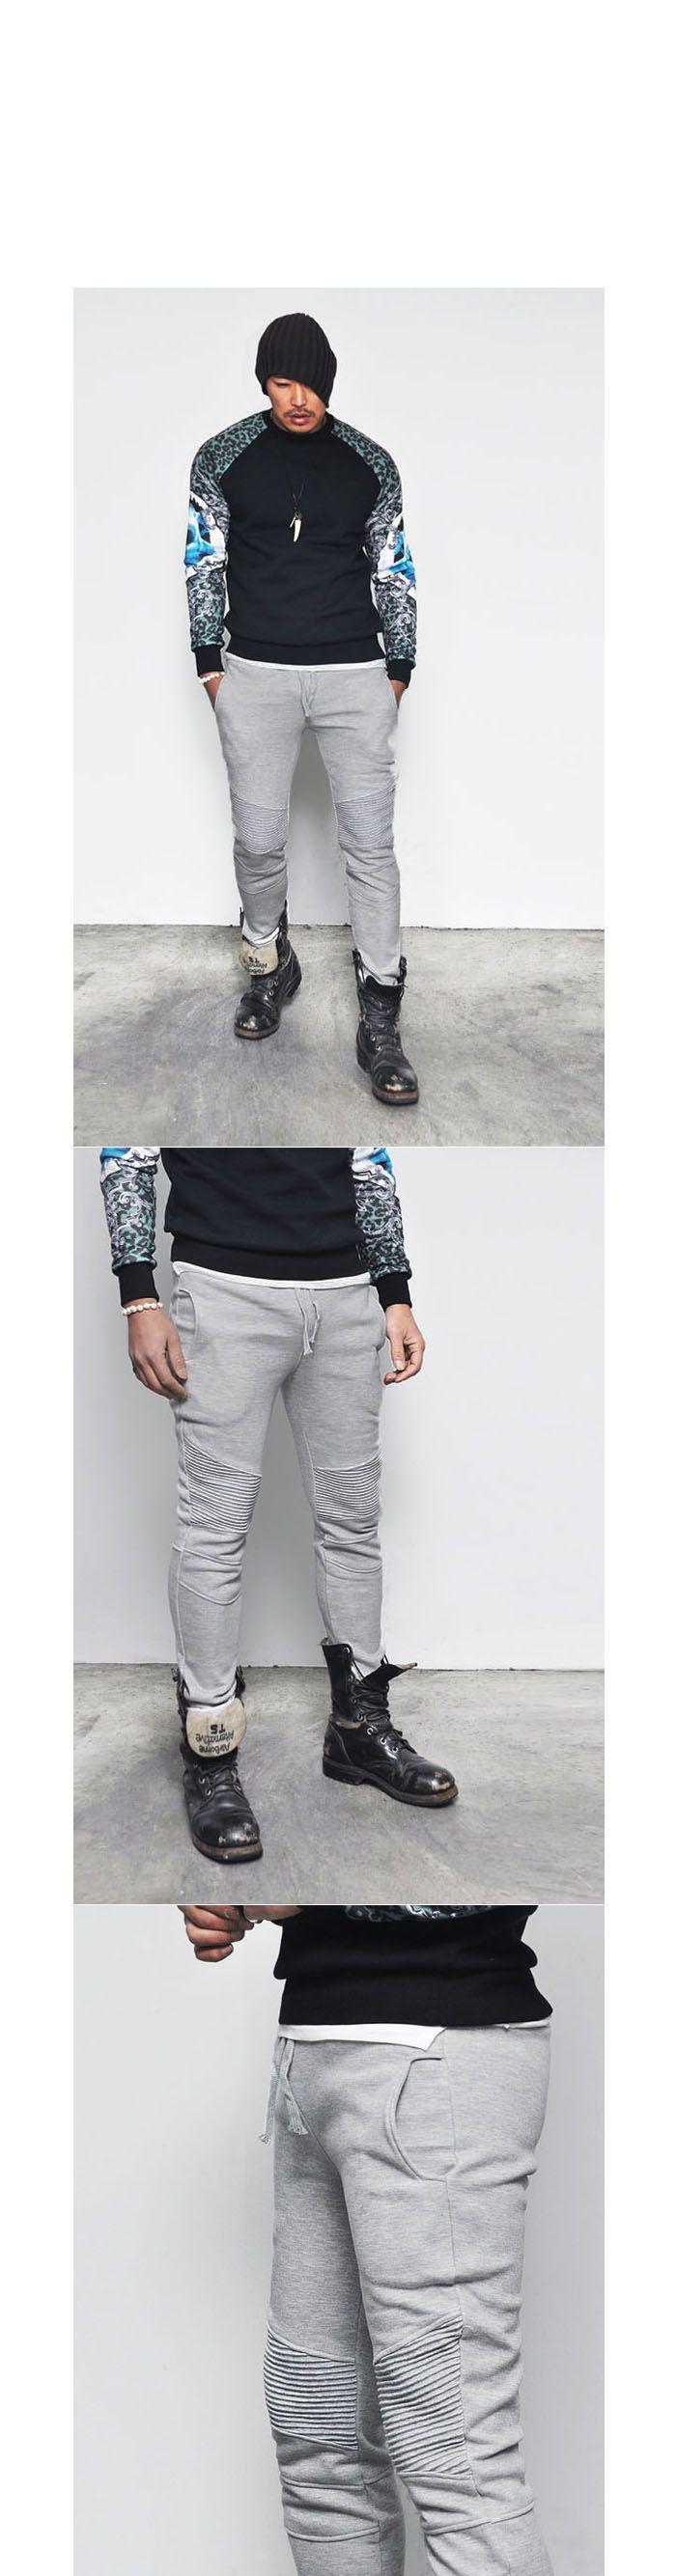 Seaming Biker Cuffed Jogger-Sweatpants 205 - GUYLOOK